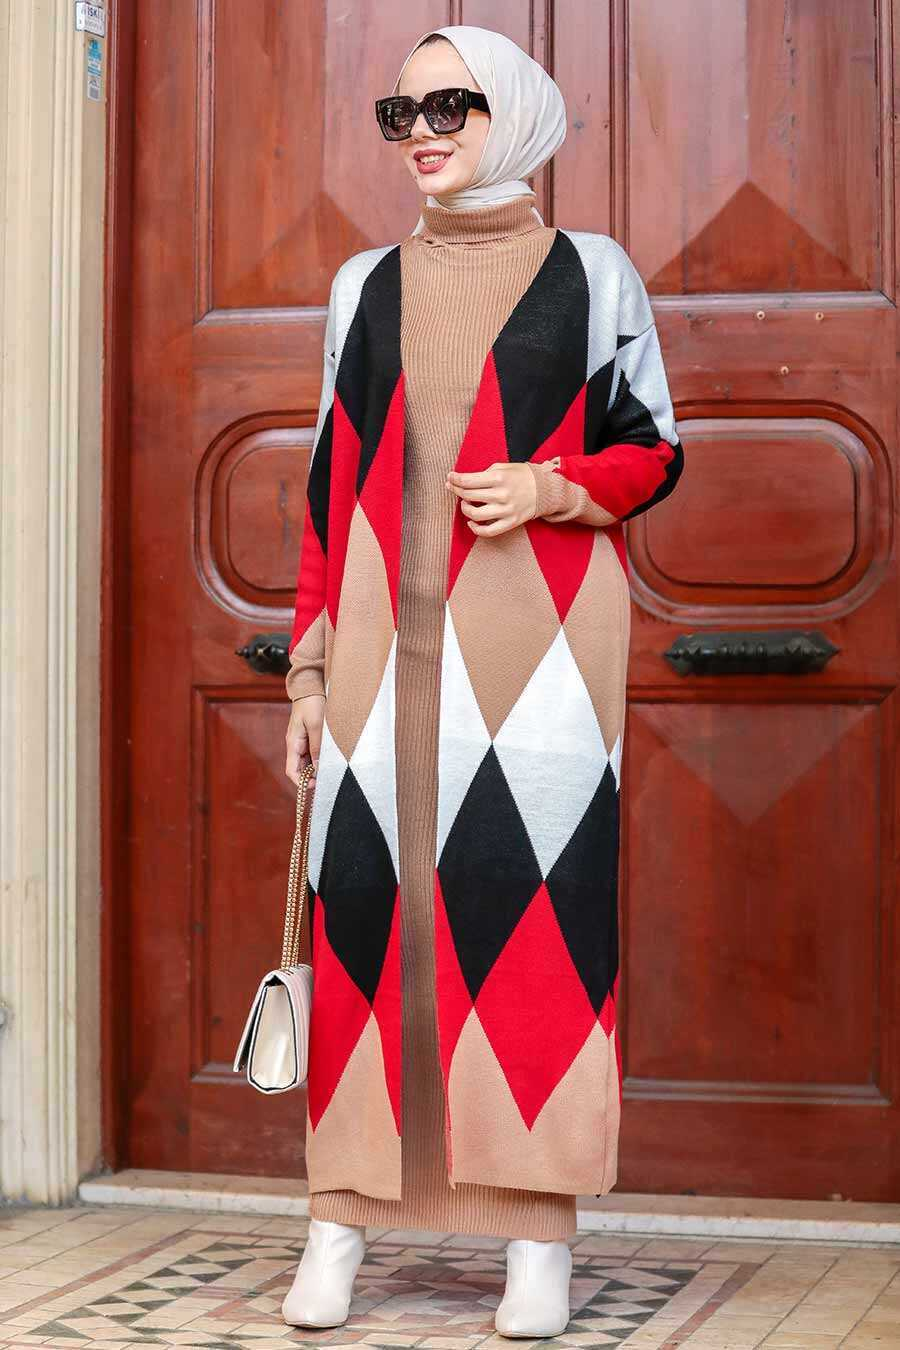 Biscuit Hijab Knitwear Suit Dress 3181BS